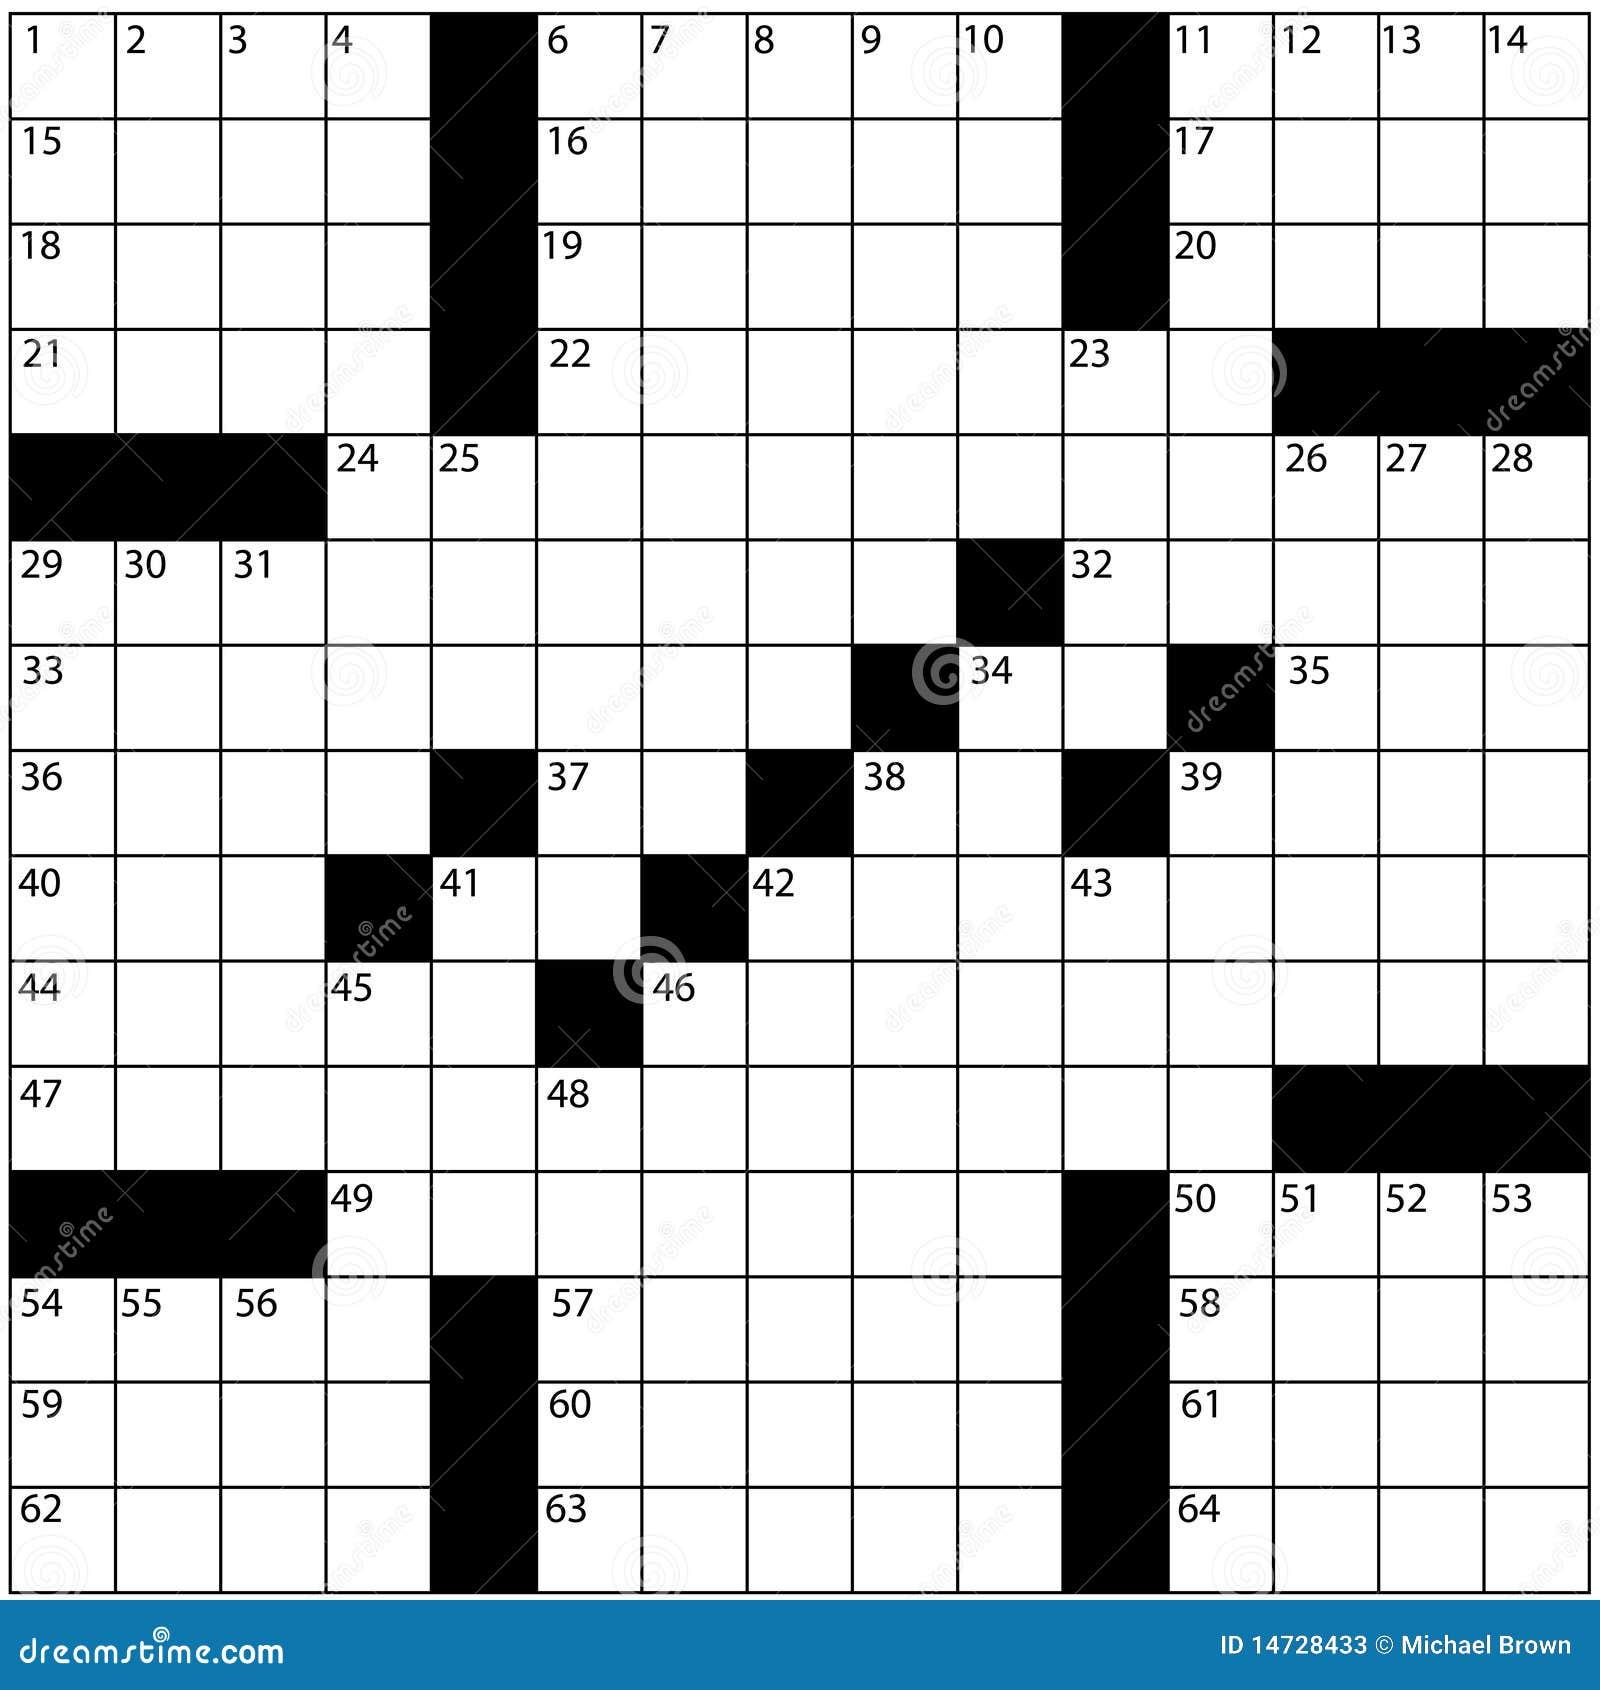 muslim dating site parody crossword puzzle